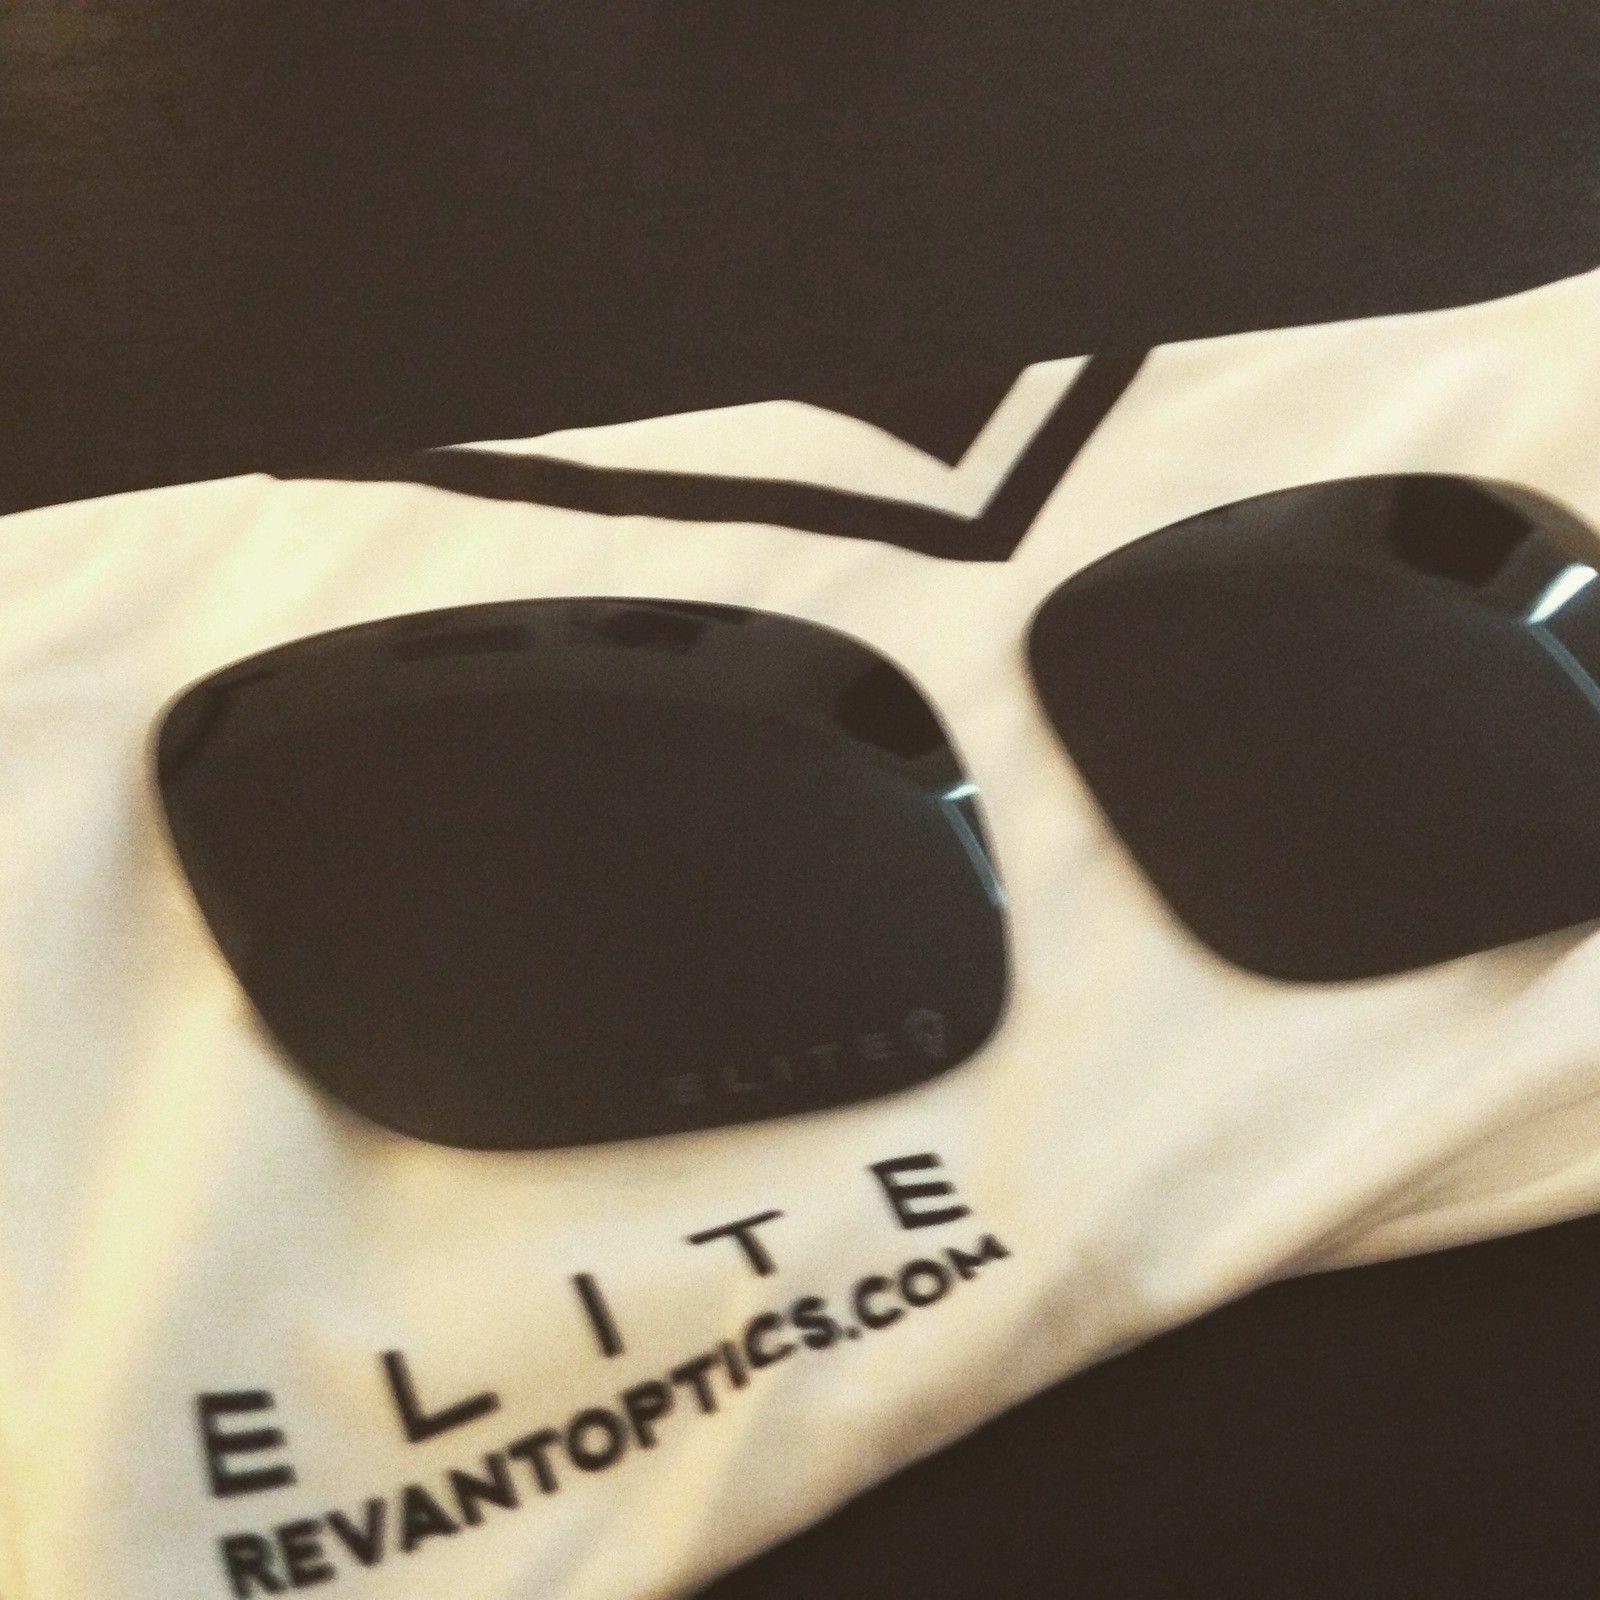 Revant Optics HC3 Elite Holbrook Lens Review - Revant_Elite_HC3_Holbrook.JPG